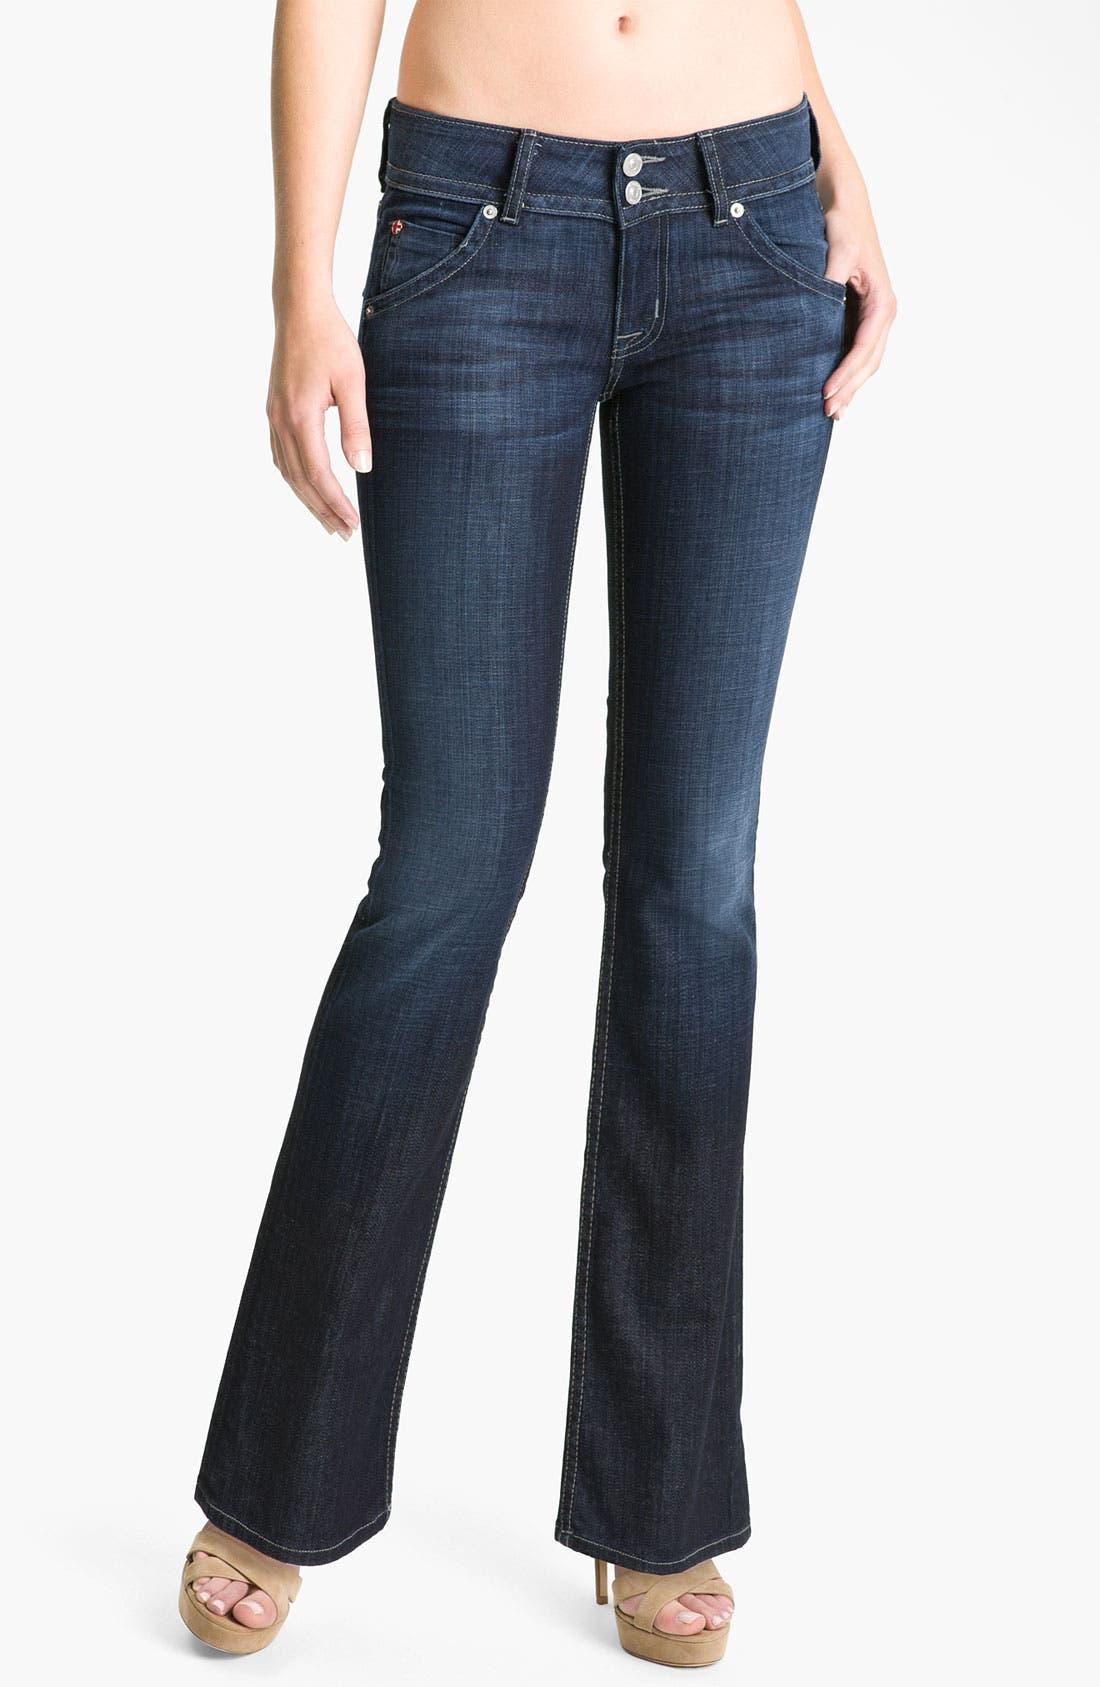 Main Image - Hudson Jeans Signature Flap Pocket Bootcut Jeans (Bowery)